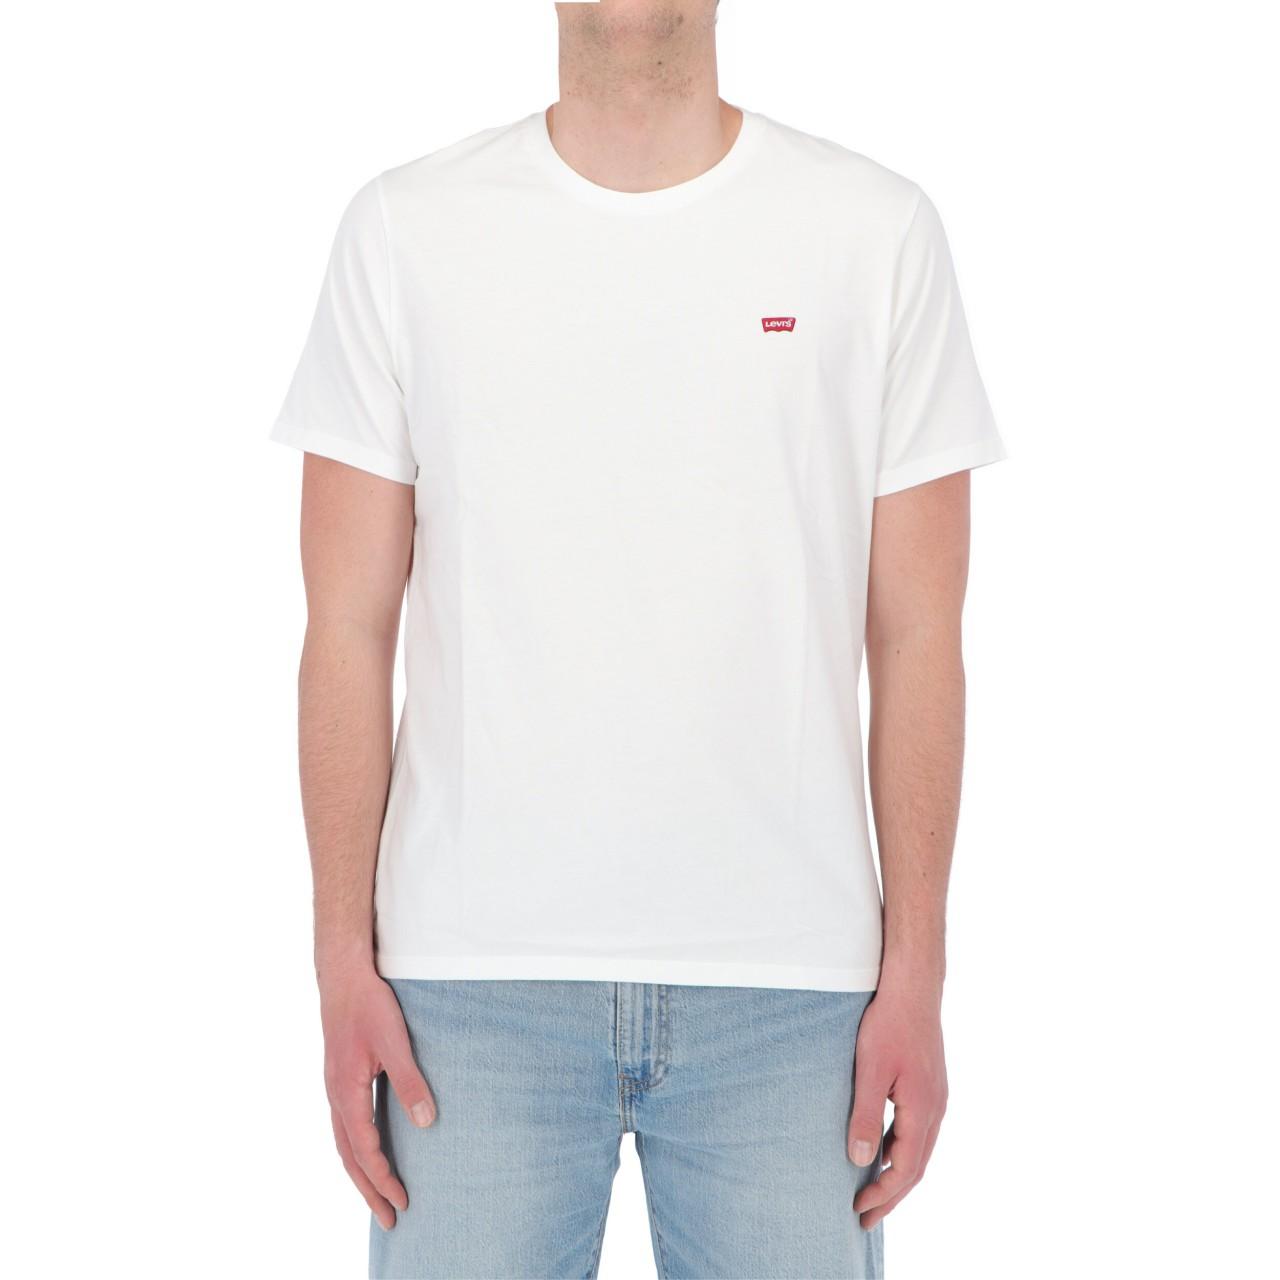 Levi's Uomo T-shirt Levi's Uomo Ss Original Hm Tee 56605P